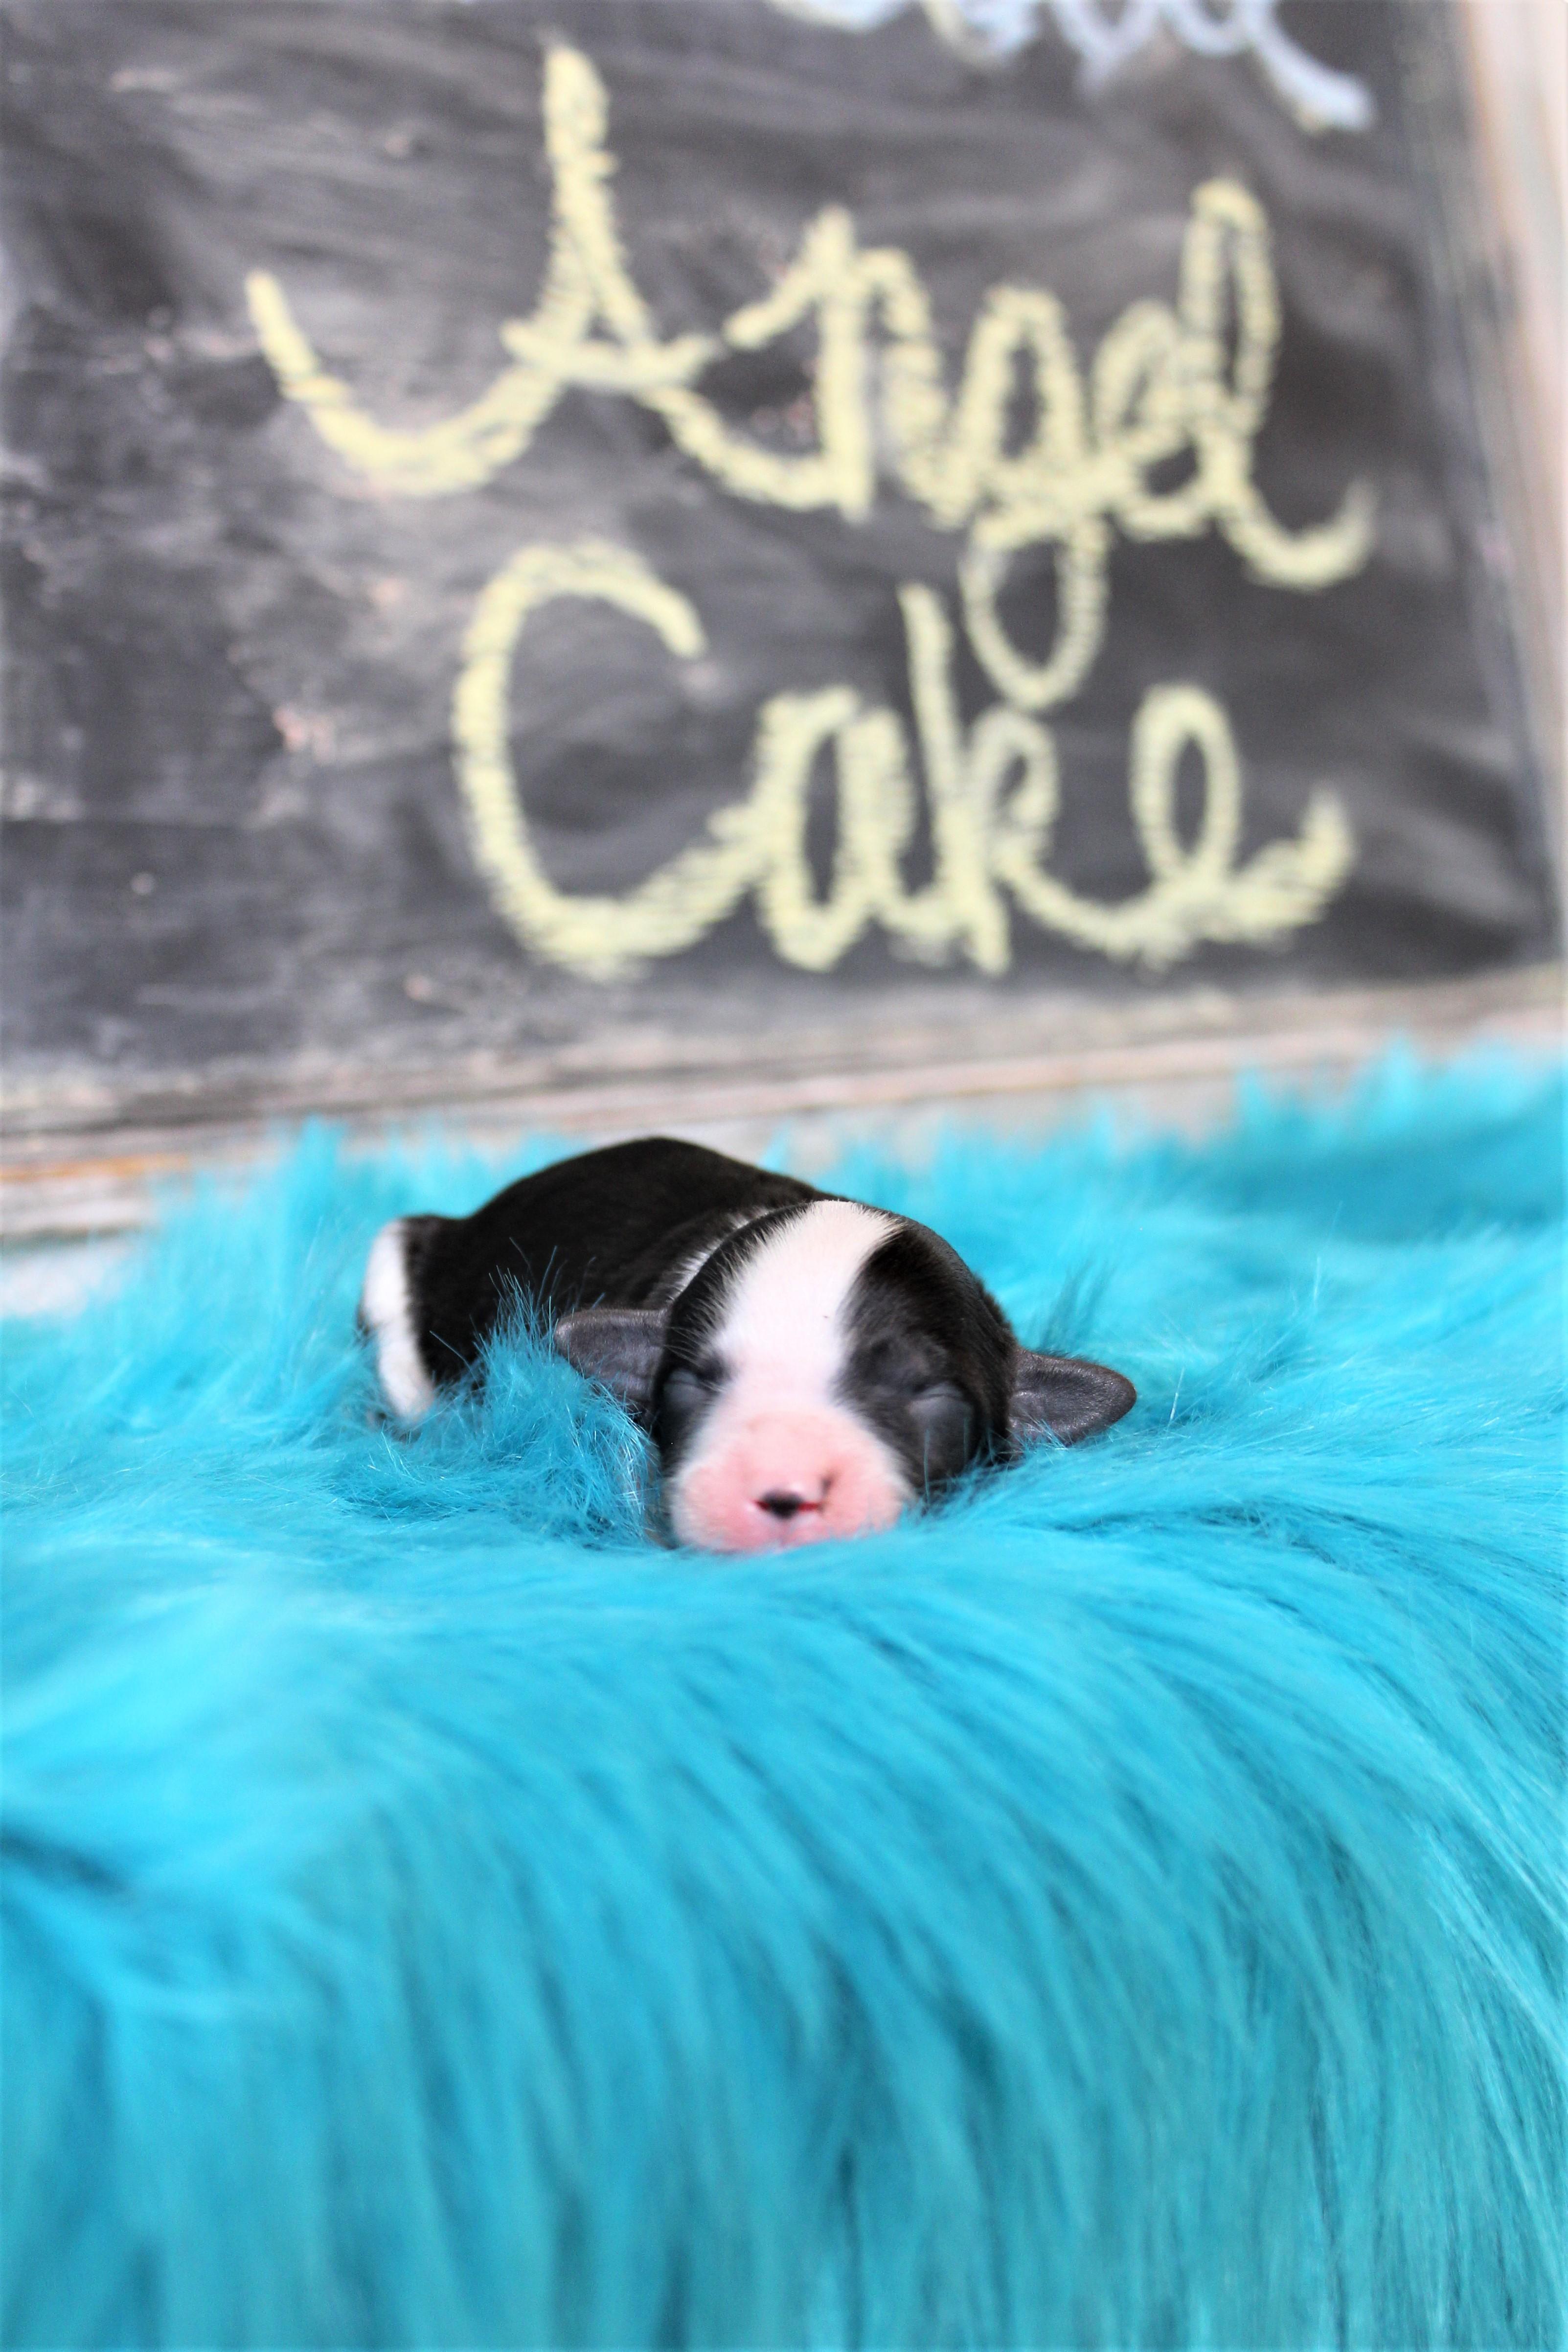 Angel Cake 1.2